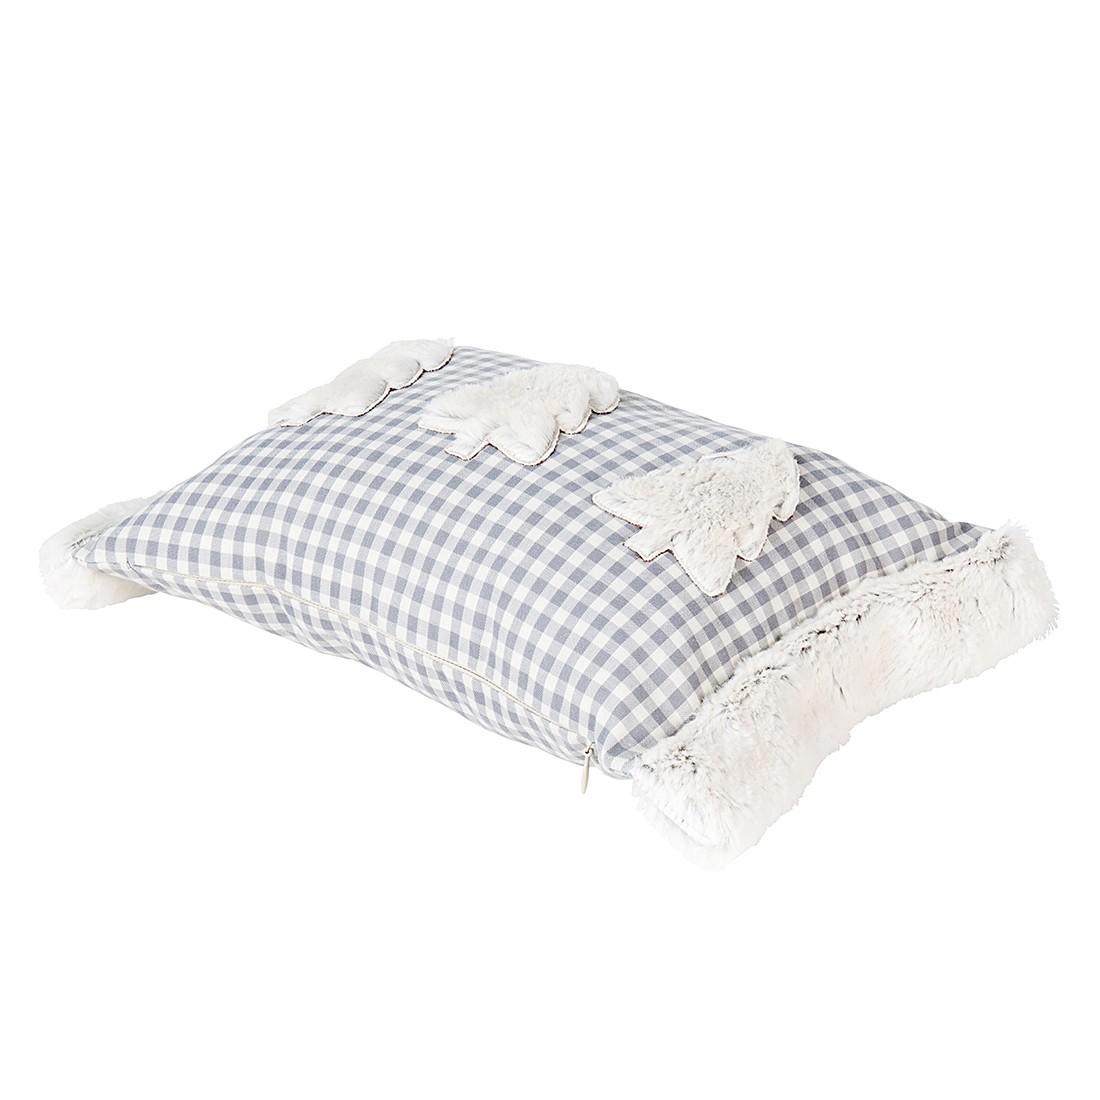 Kissen (32 x 24 cm) Finn – Grau, 2Lif jetzt kaufen